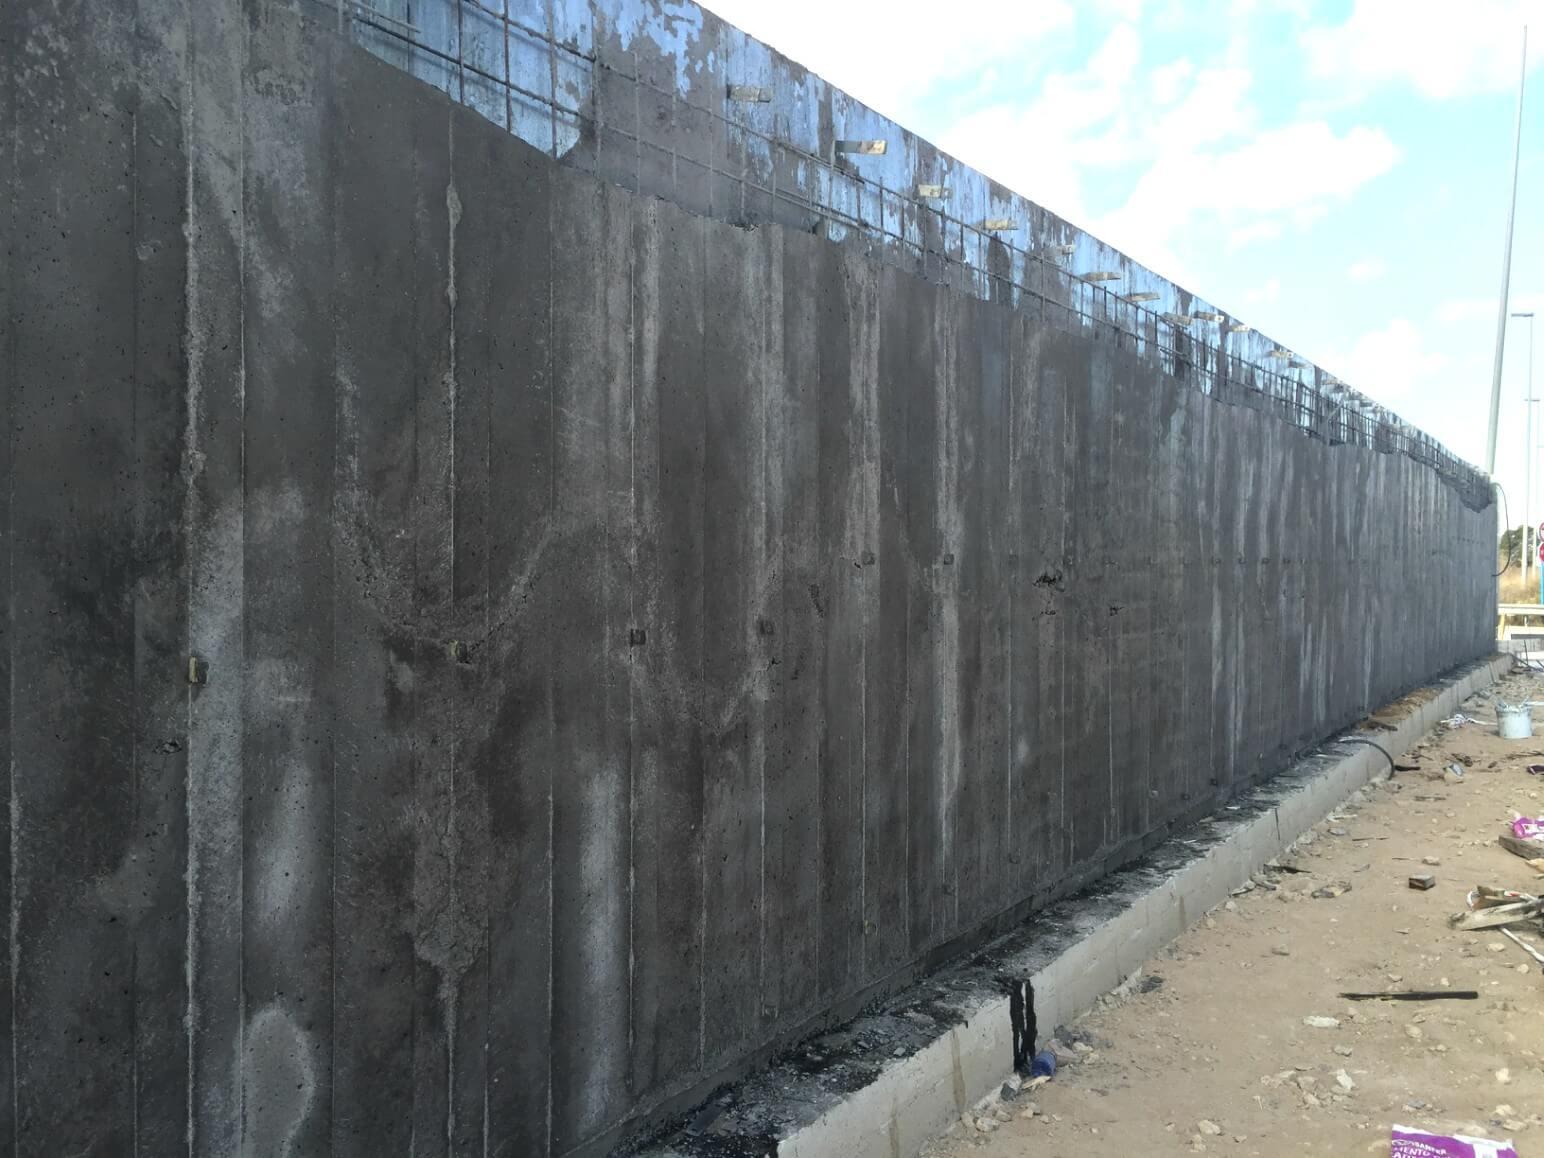 proyecto muro perimetral encofrados de aluminio construccion strong forms alicante 16